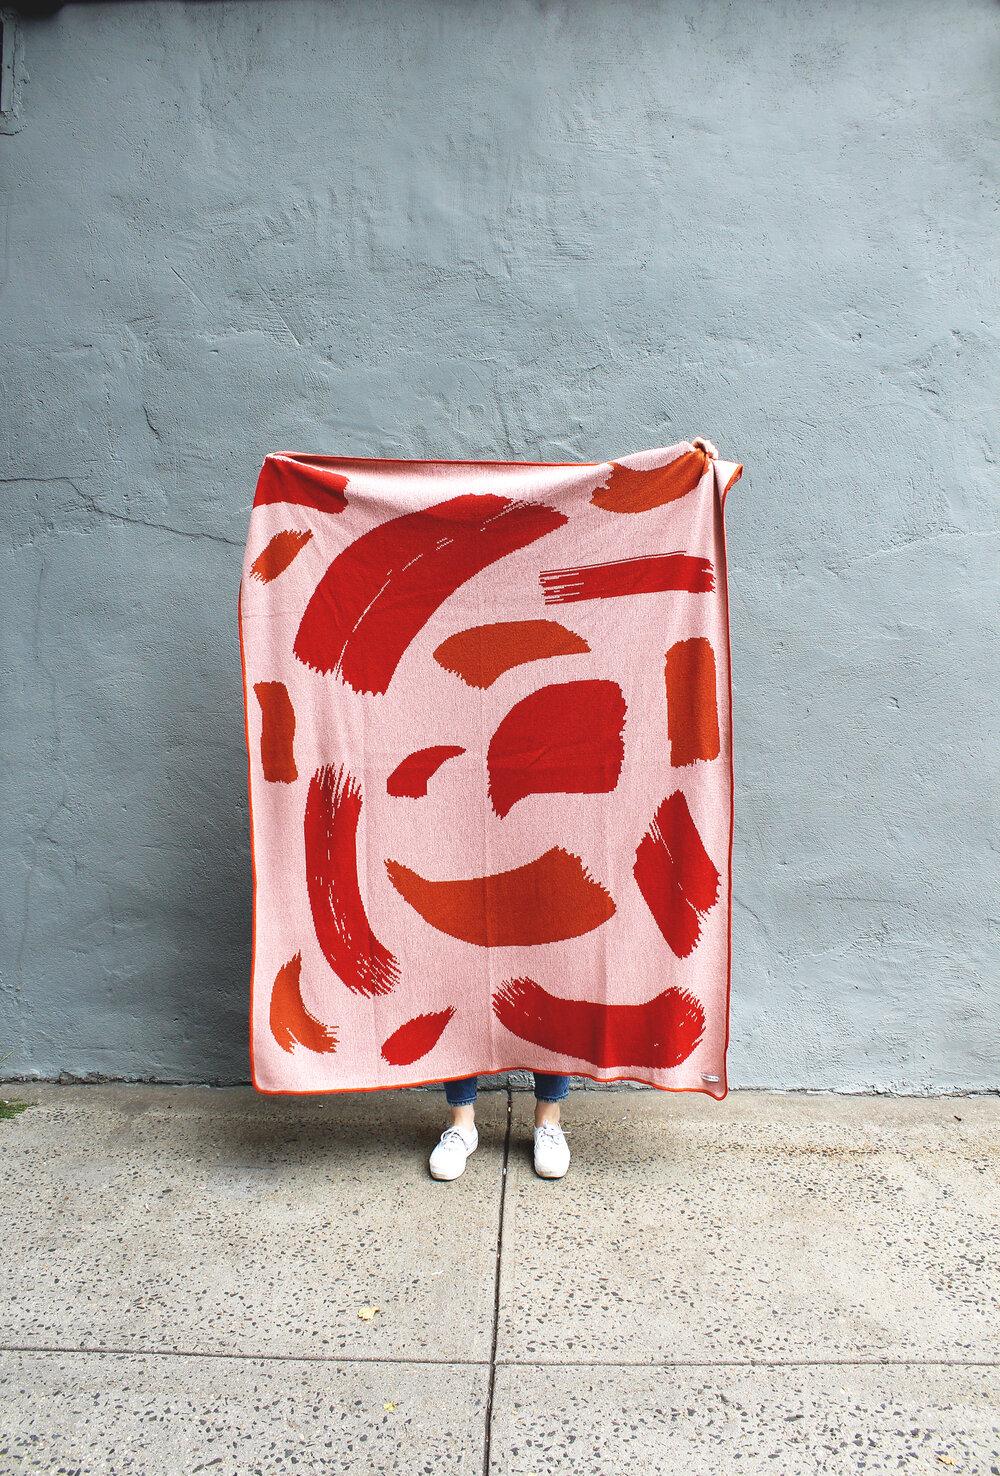 Paint Streaks In Warm Tones Knit Throw Blanket Calhoun Co In 2020 Knitted Throws Knit Throw Blanket Gifts For An Artist